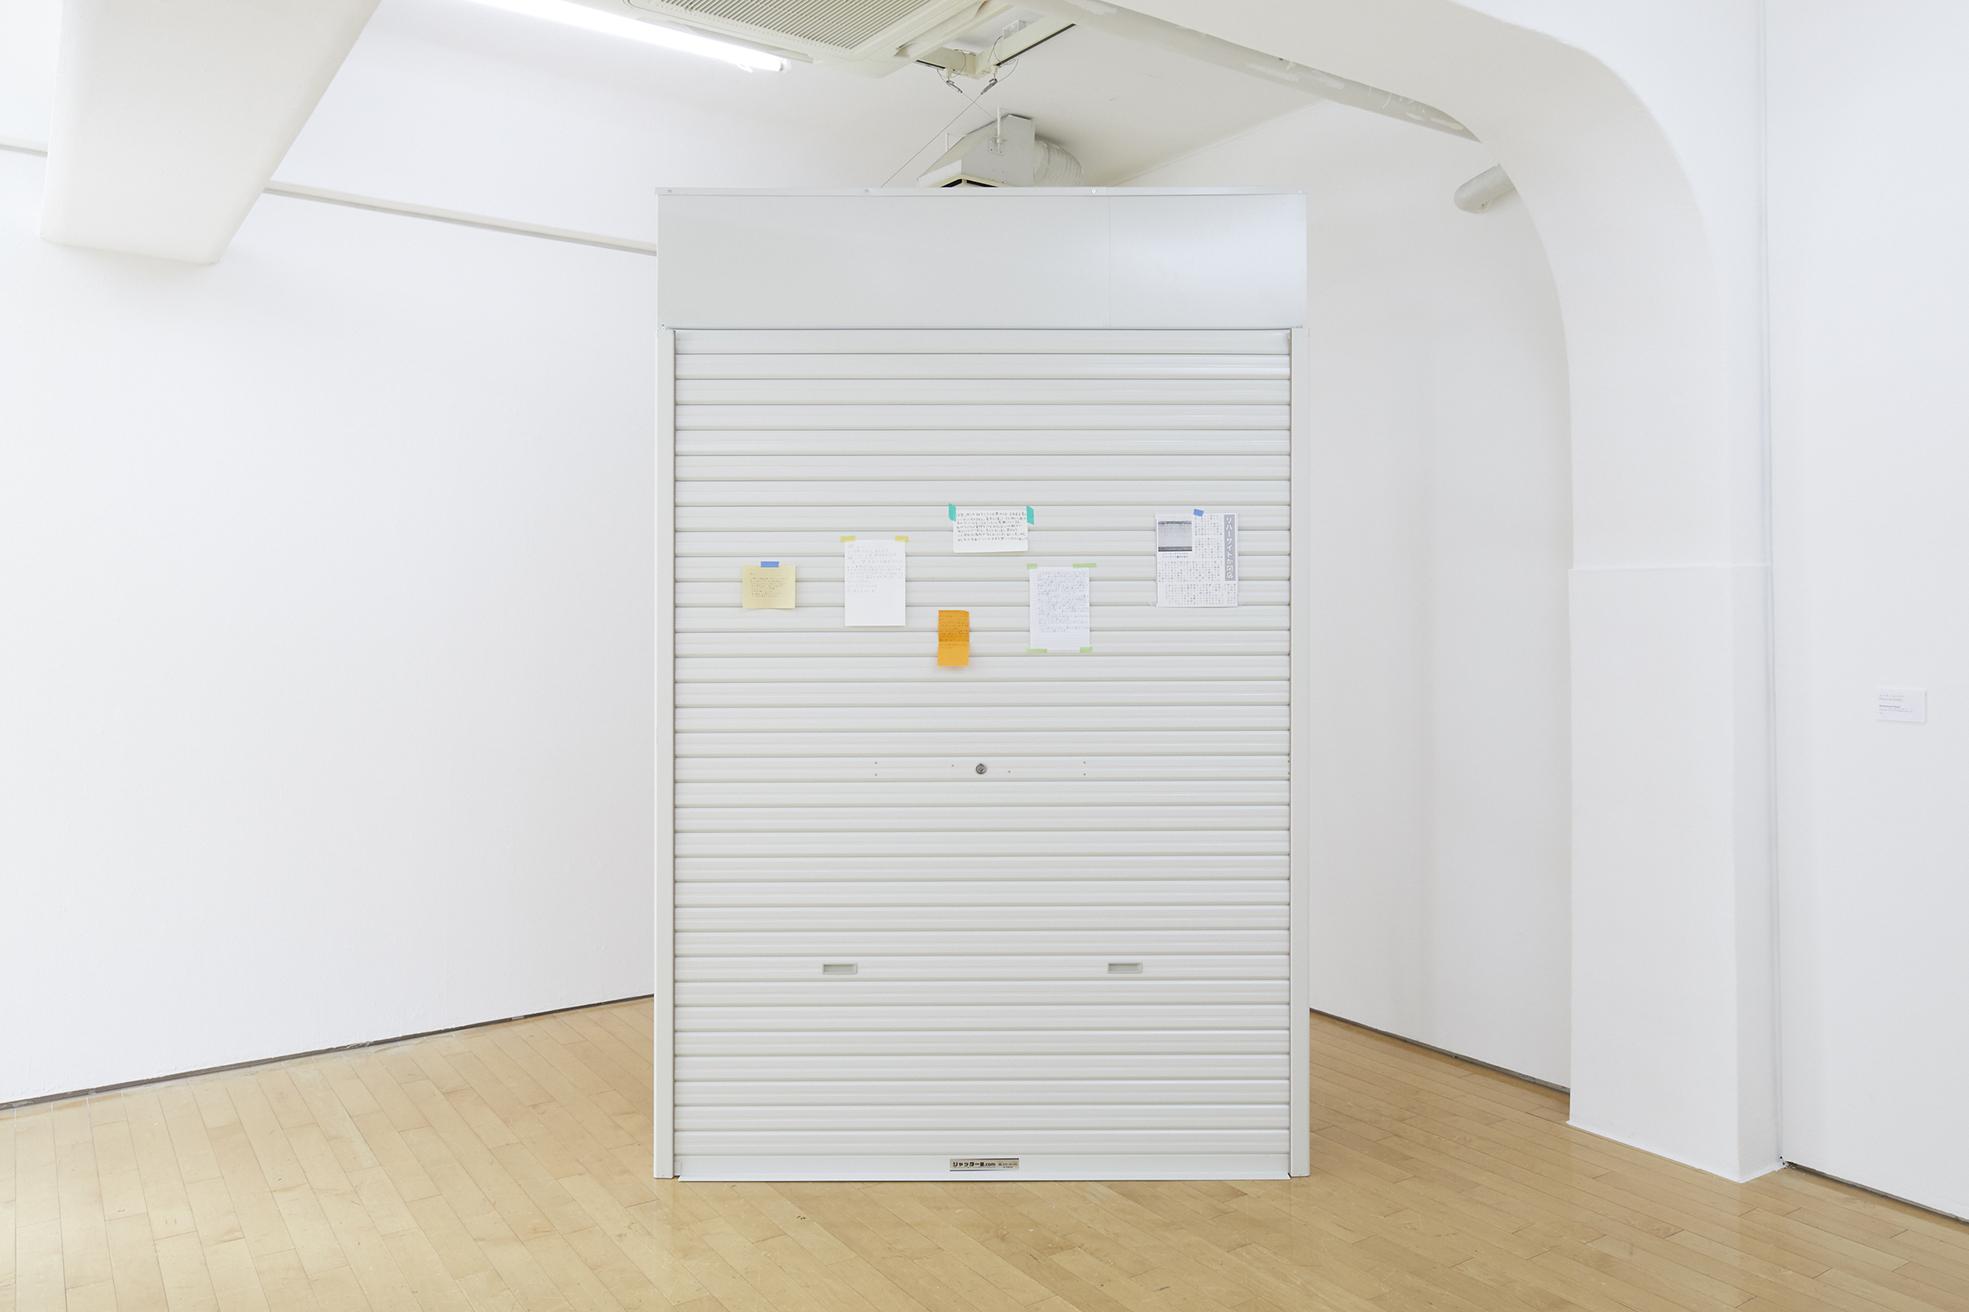 Elisa Caldana, Shutterstreet (Tokyo), 2019